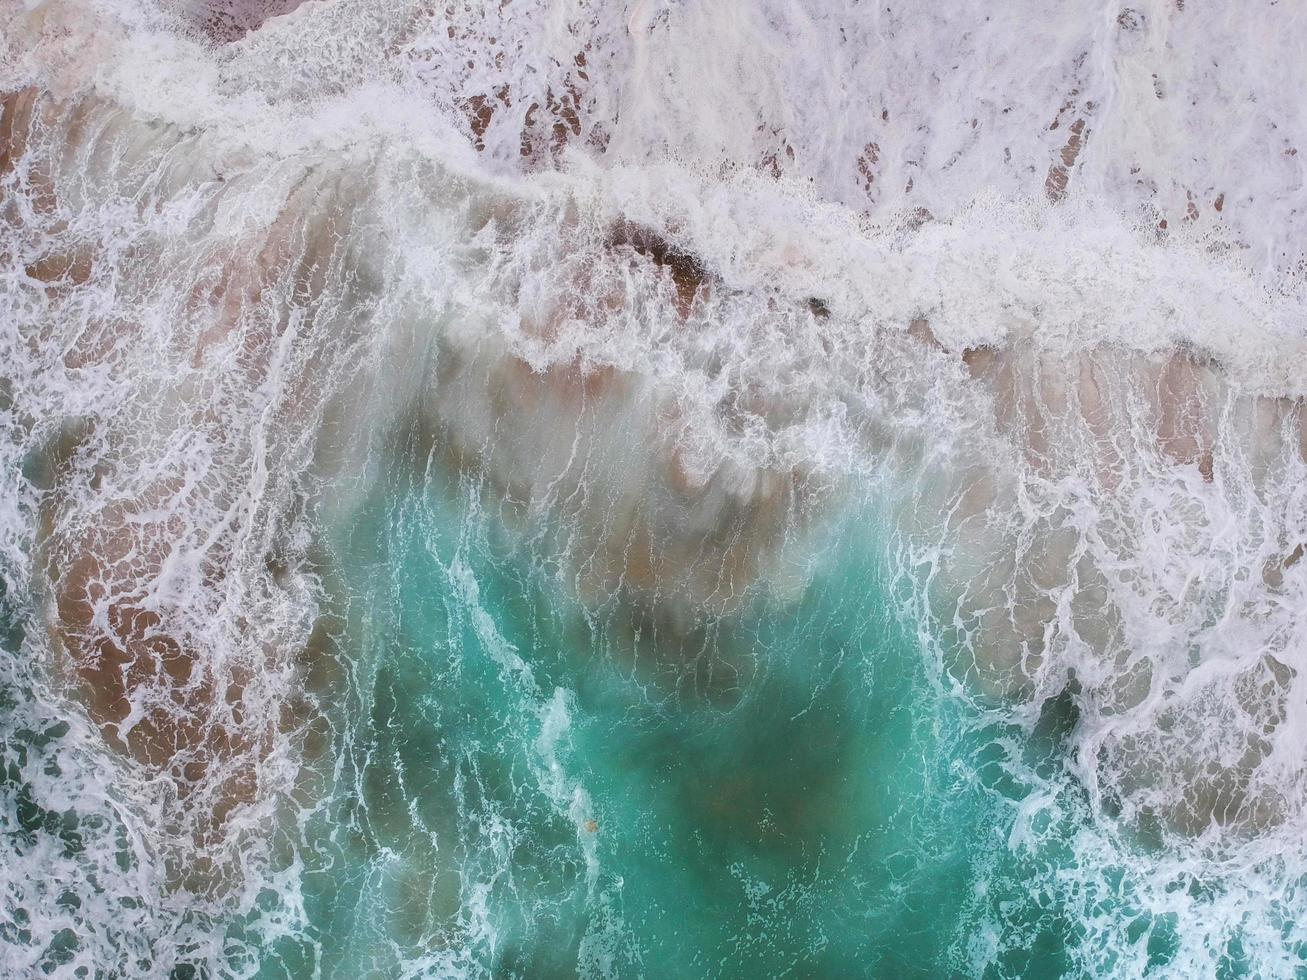 vagues de l'océan d'en haut photo